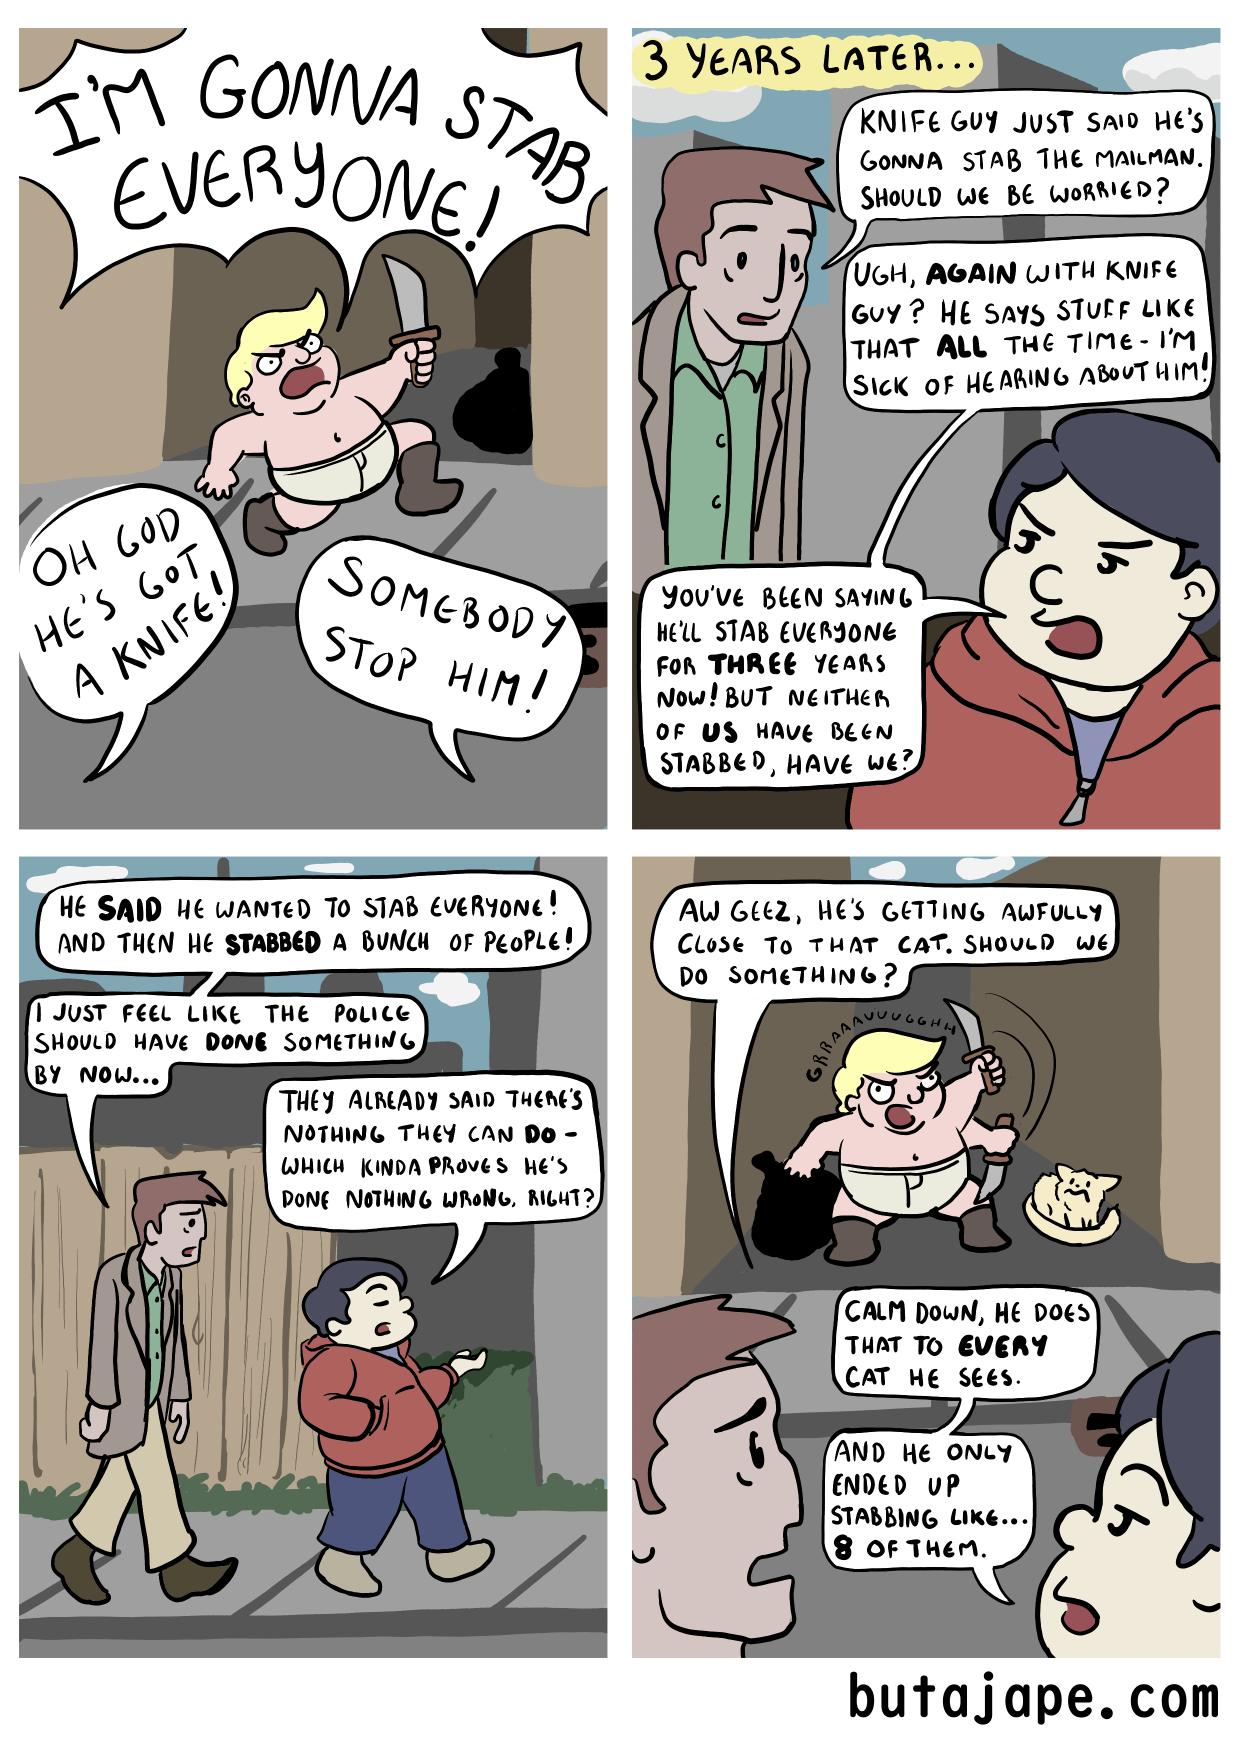 knife guy comic